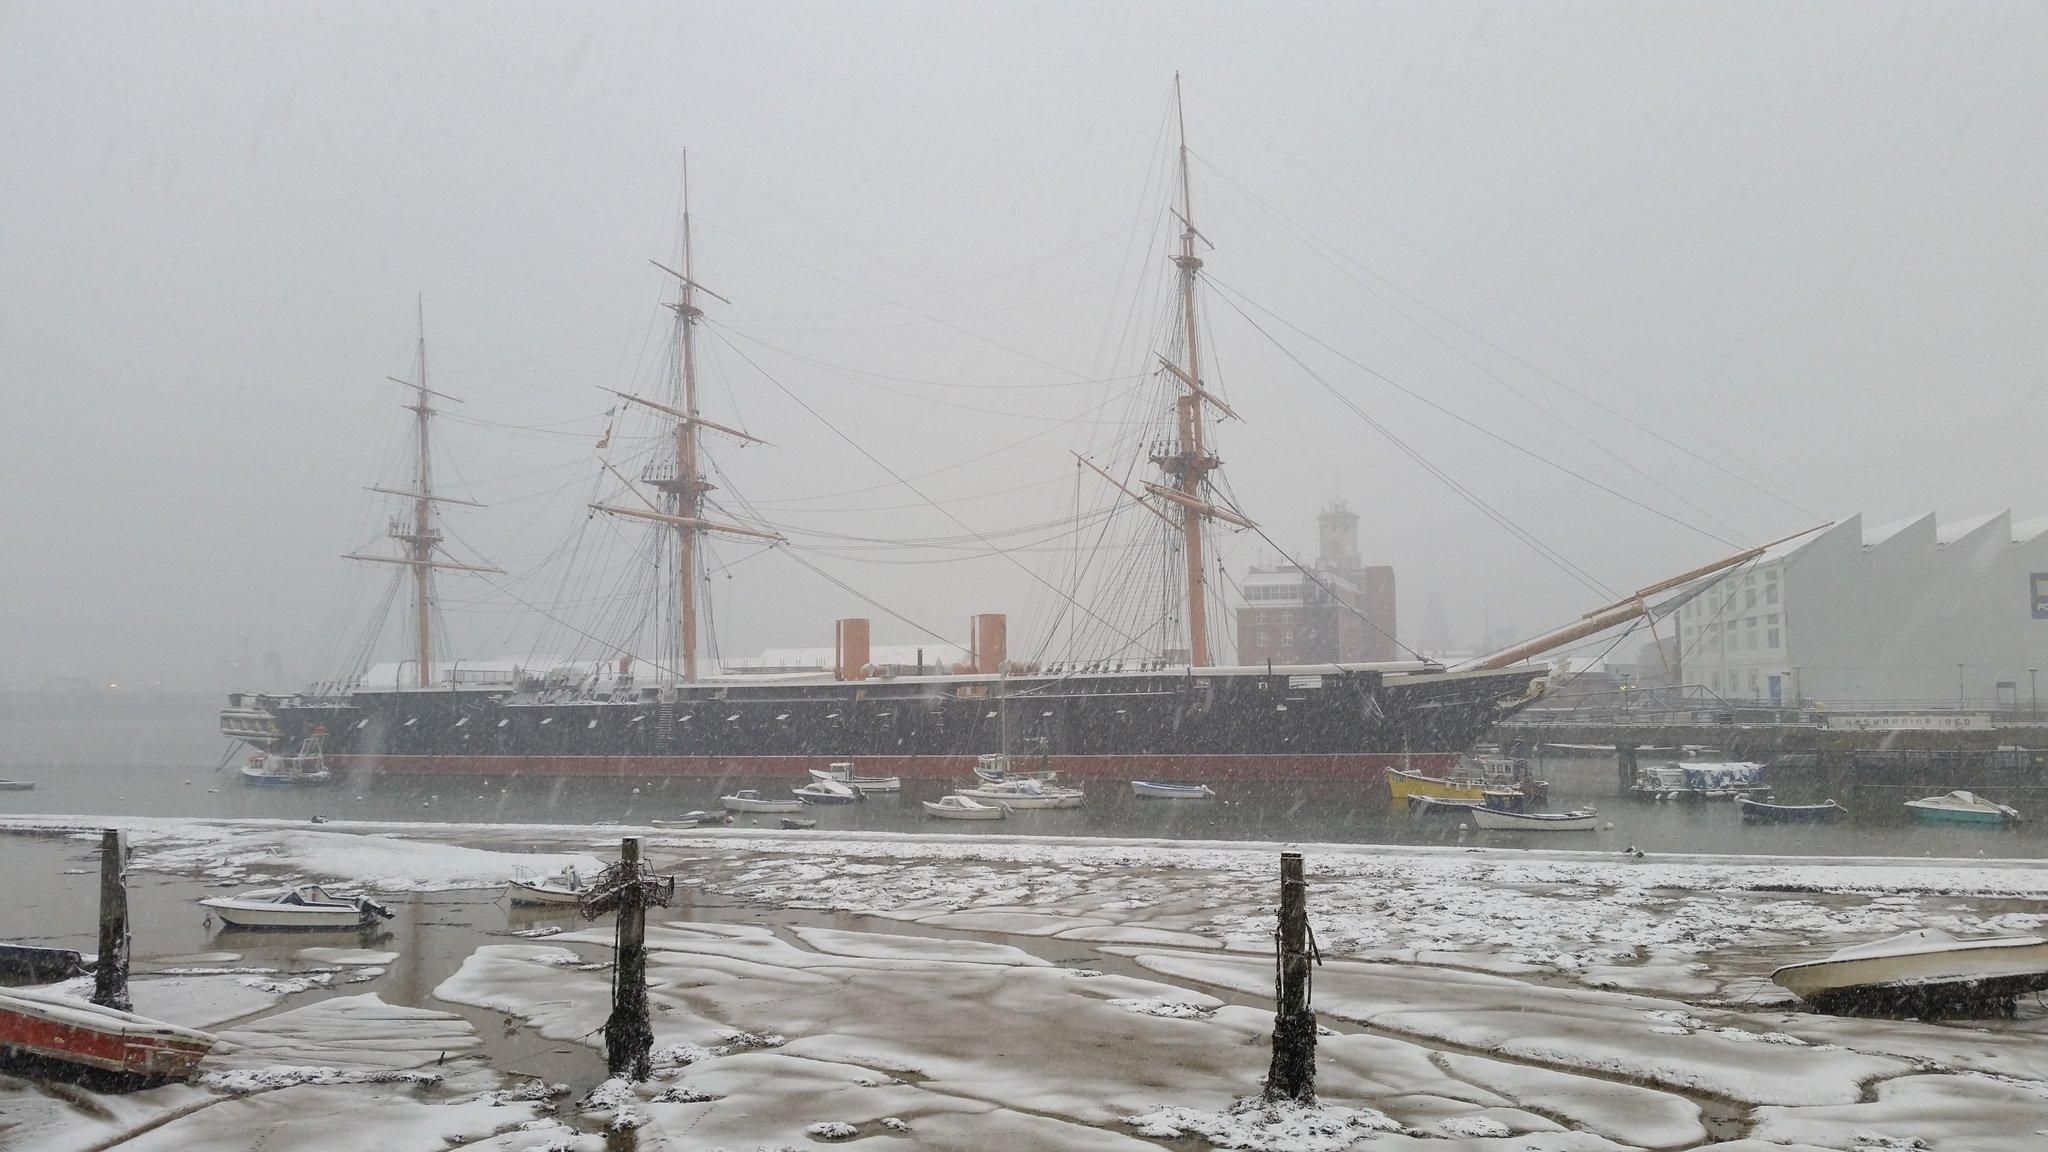 RT @SilverAhoy: HMS Warrior at…